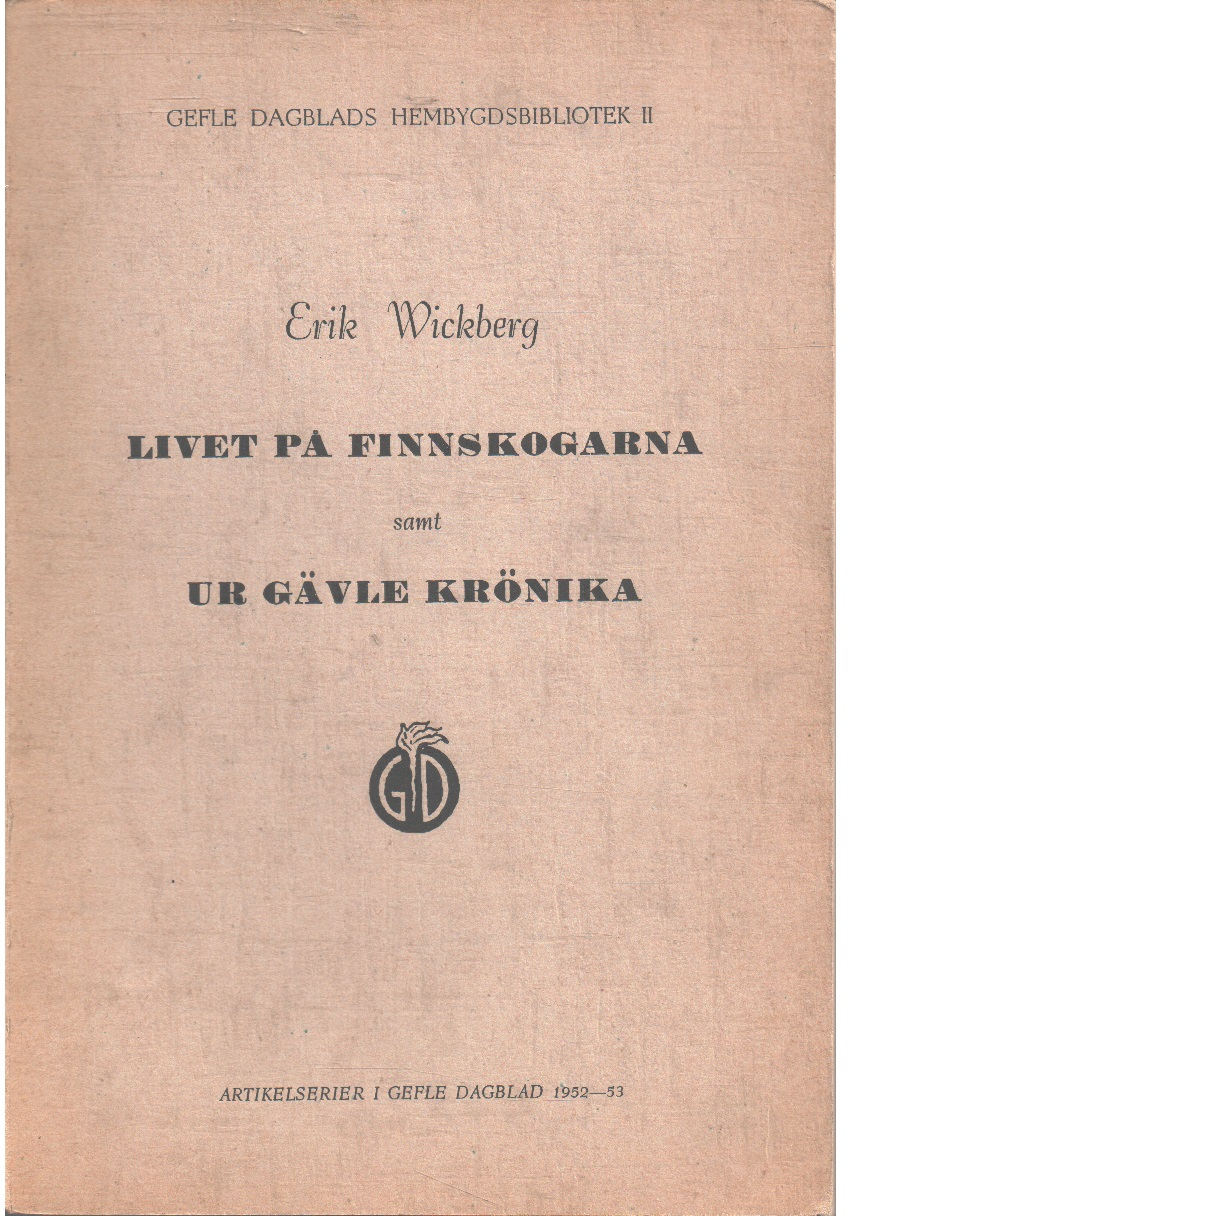 Livet på Finnskogarna samt ur Gävle krönika - Wickberg, Erik